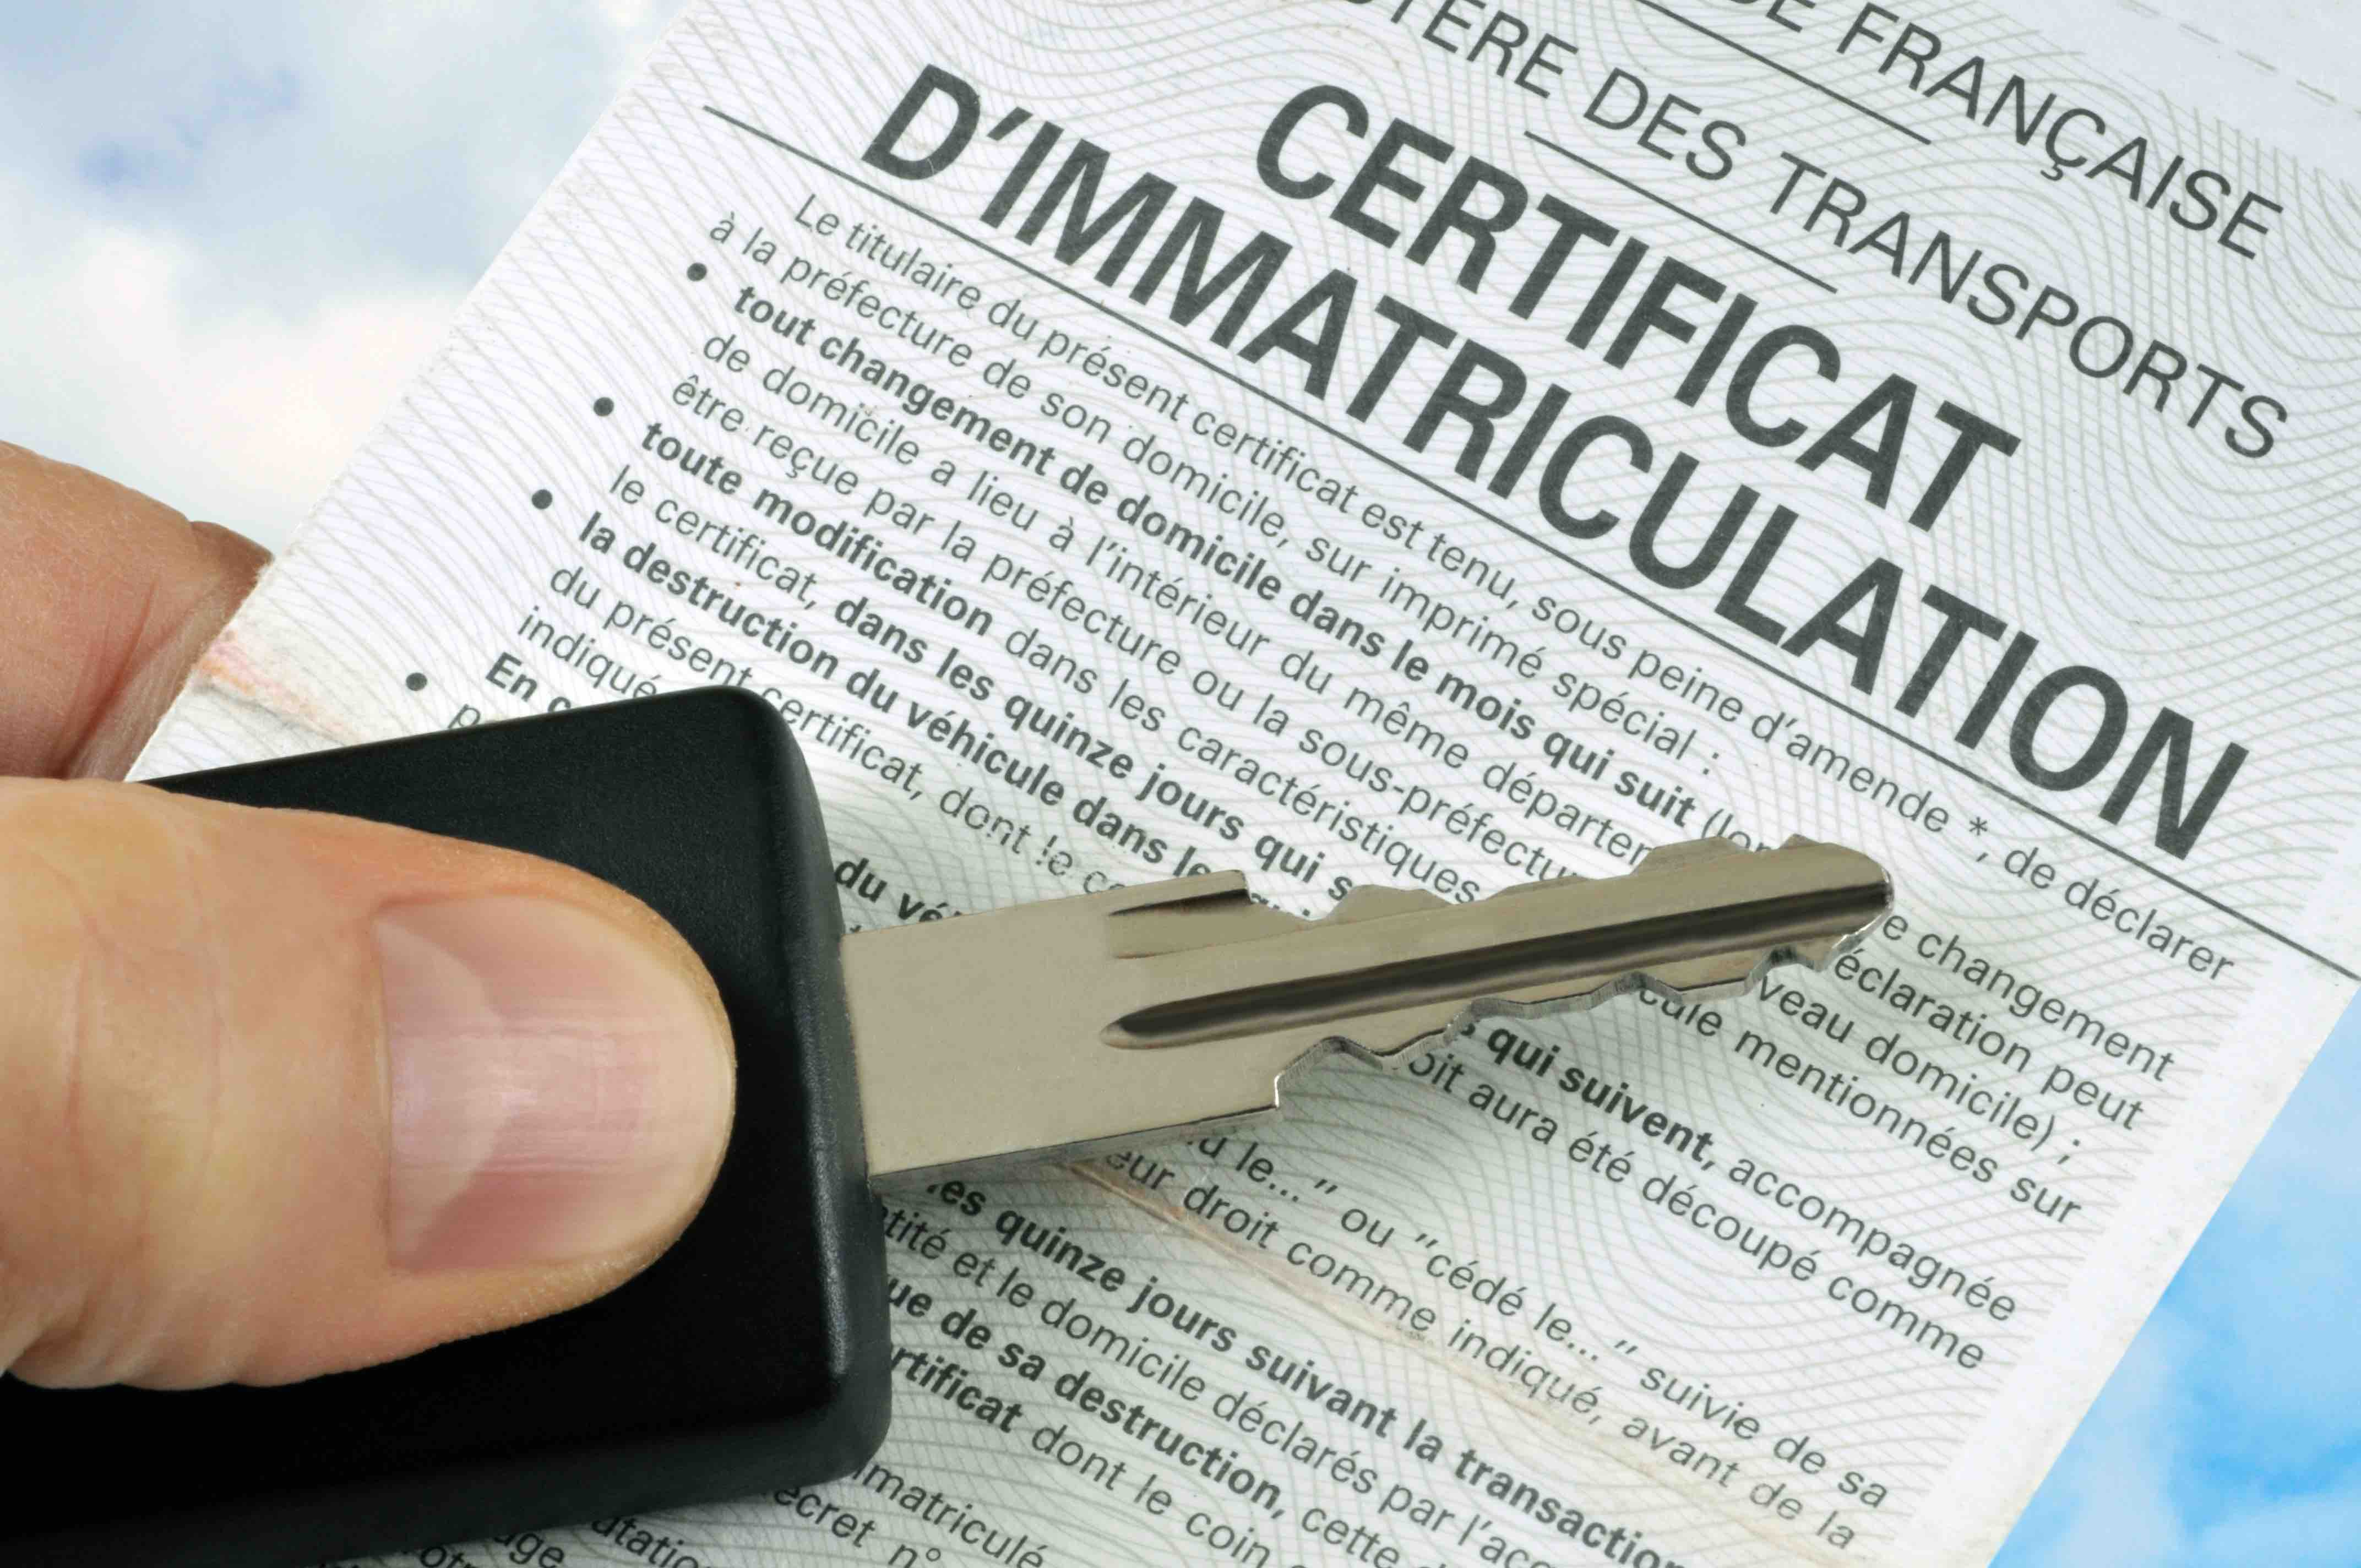 carte grise , ou aussi appelé certificat immatriculation